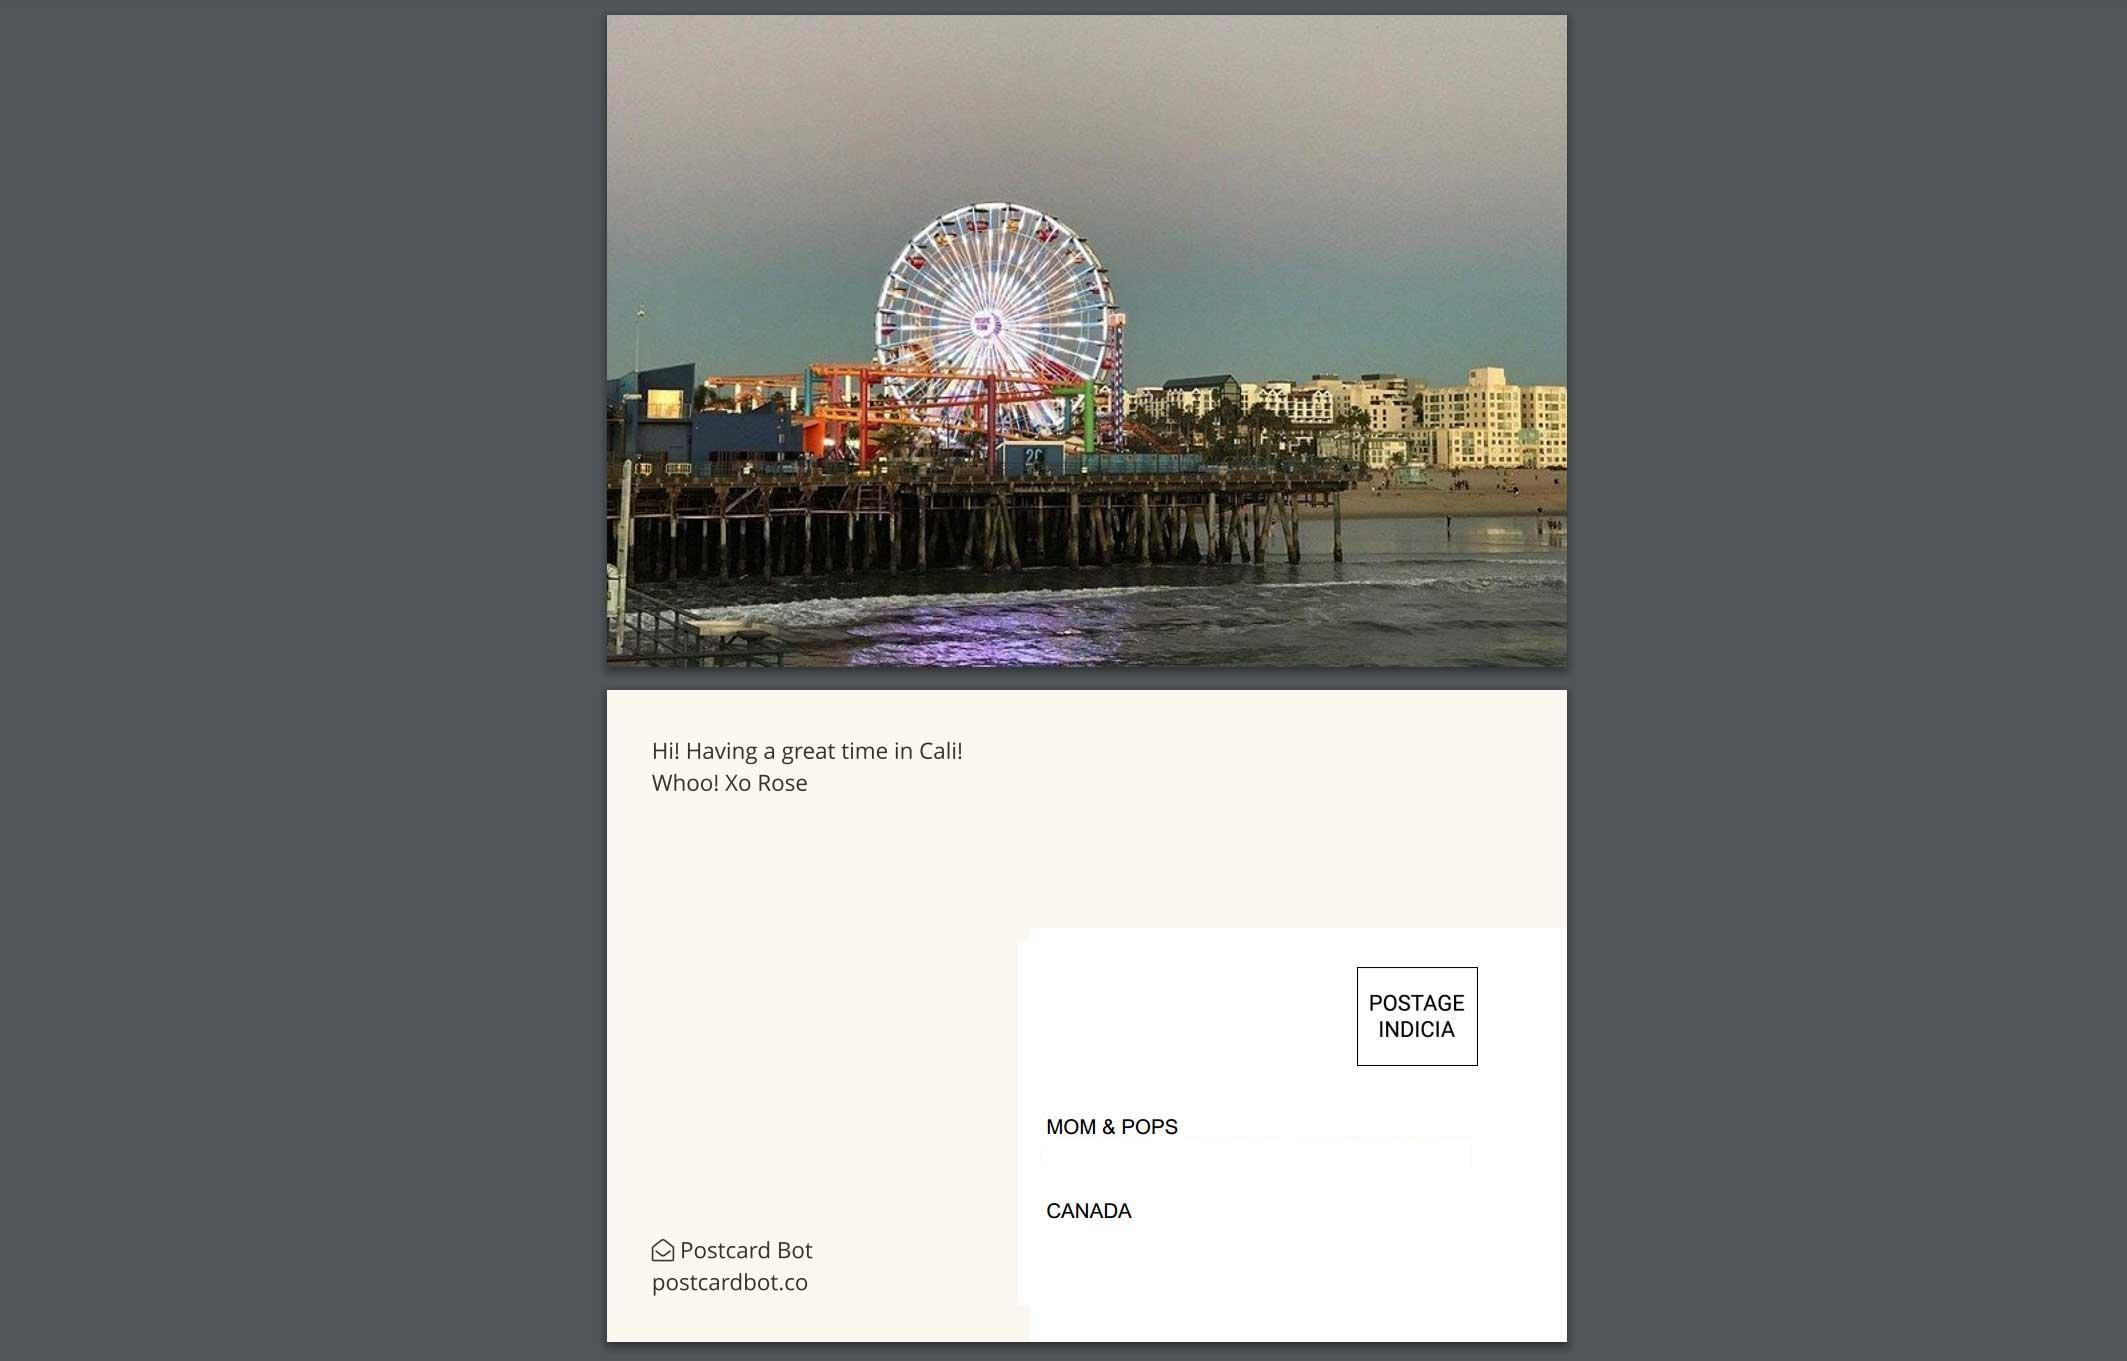 california santa monica ferris wheel postcard mockup - postcard bot